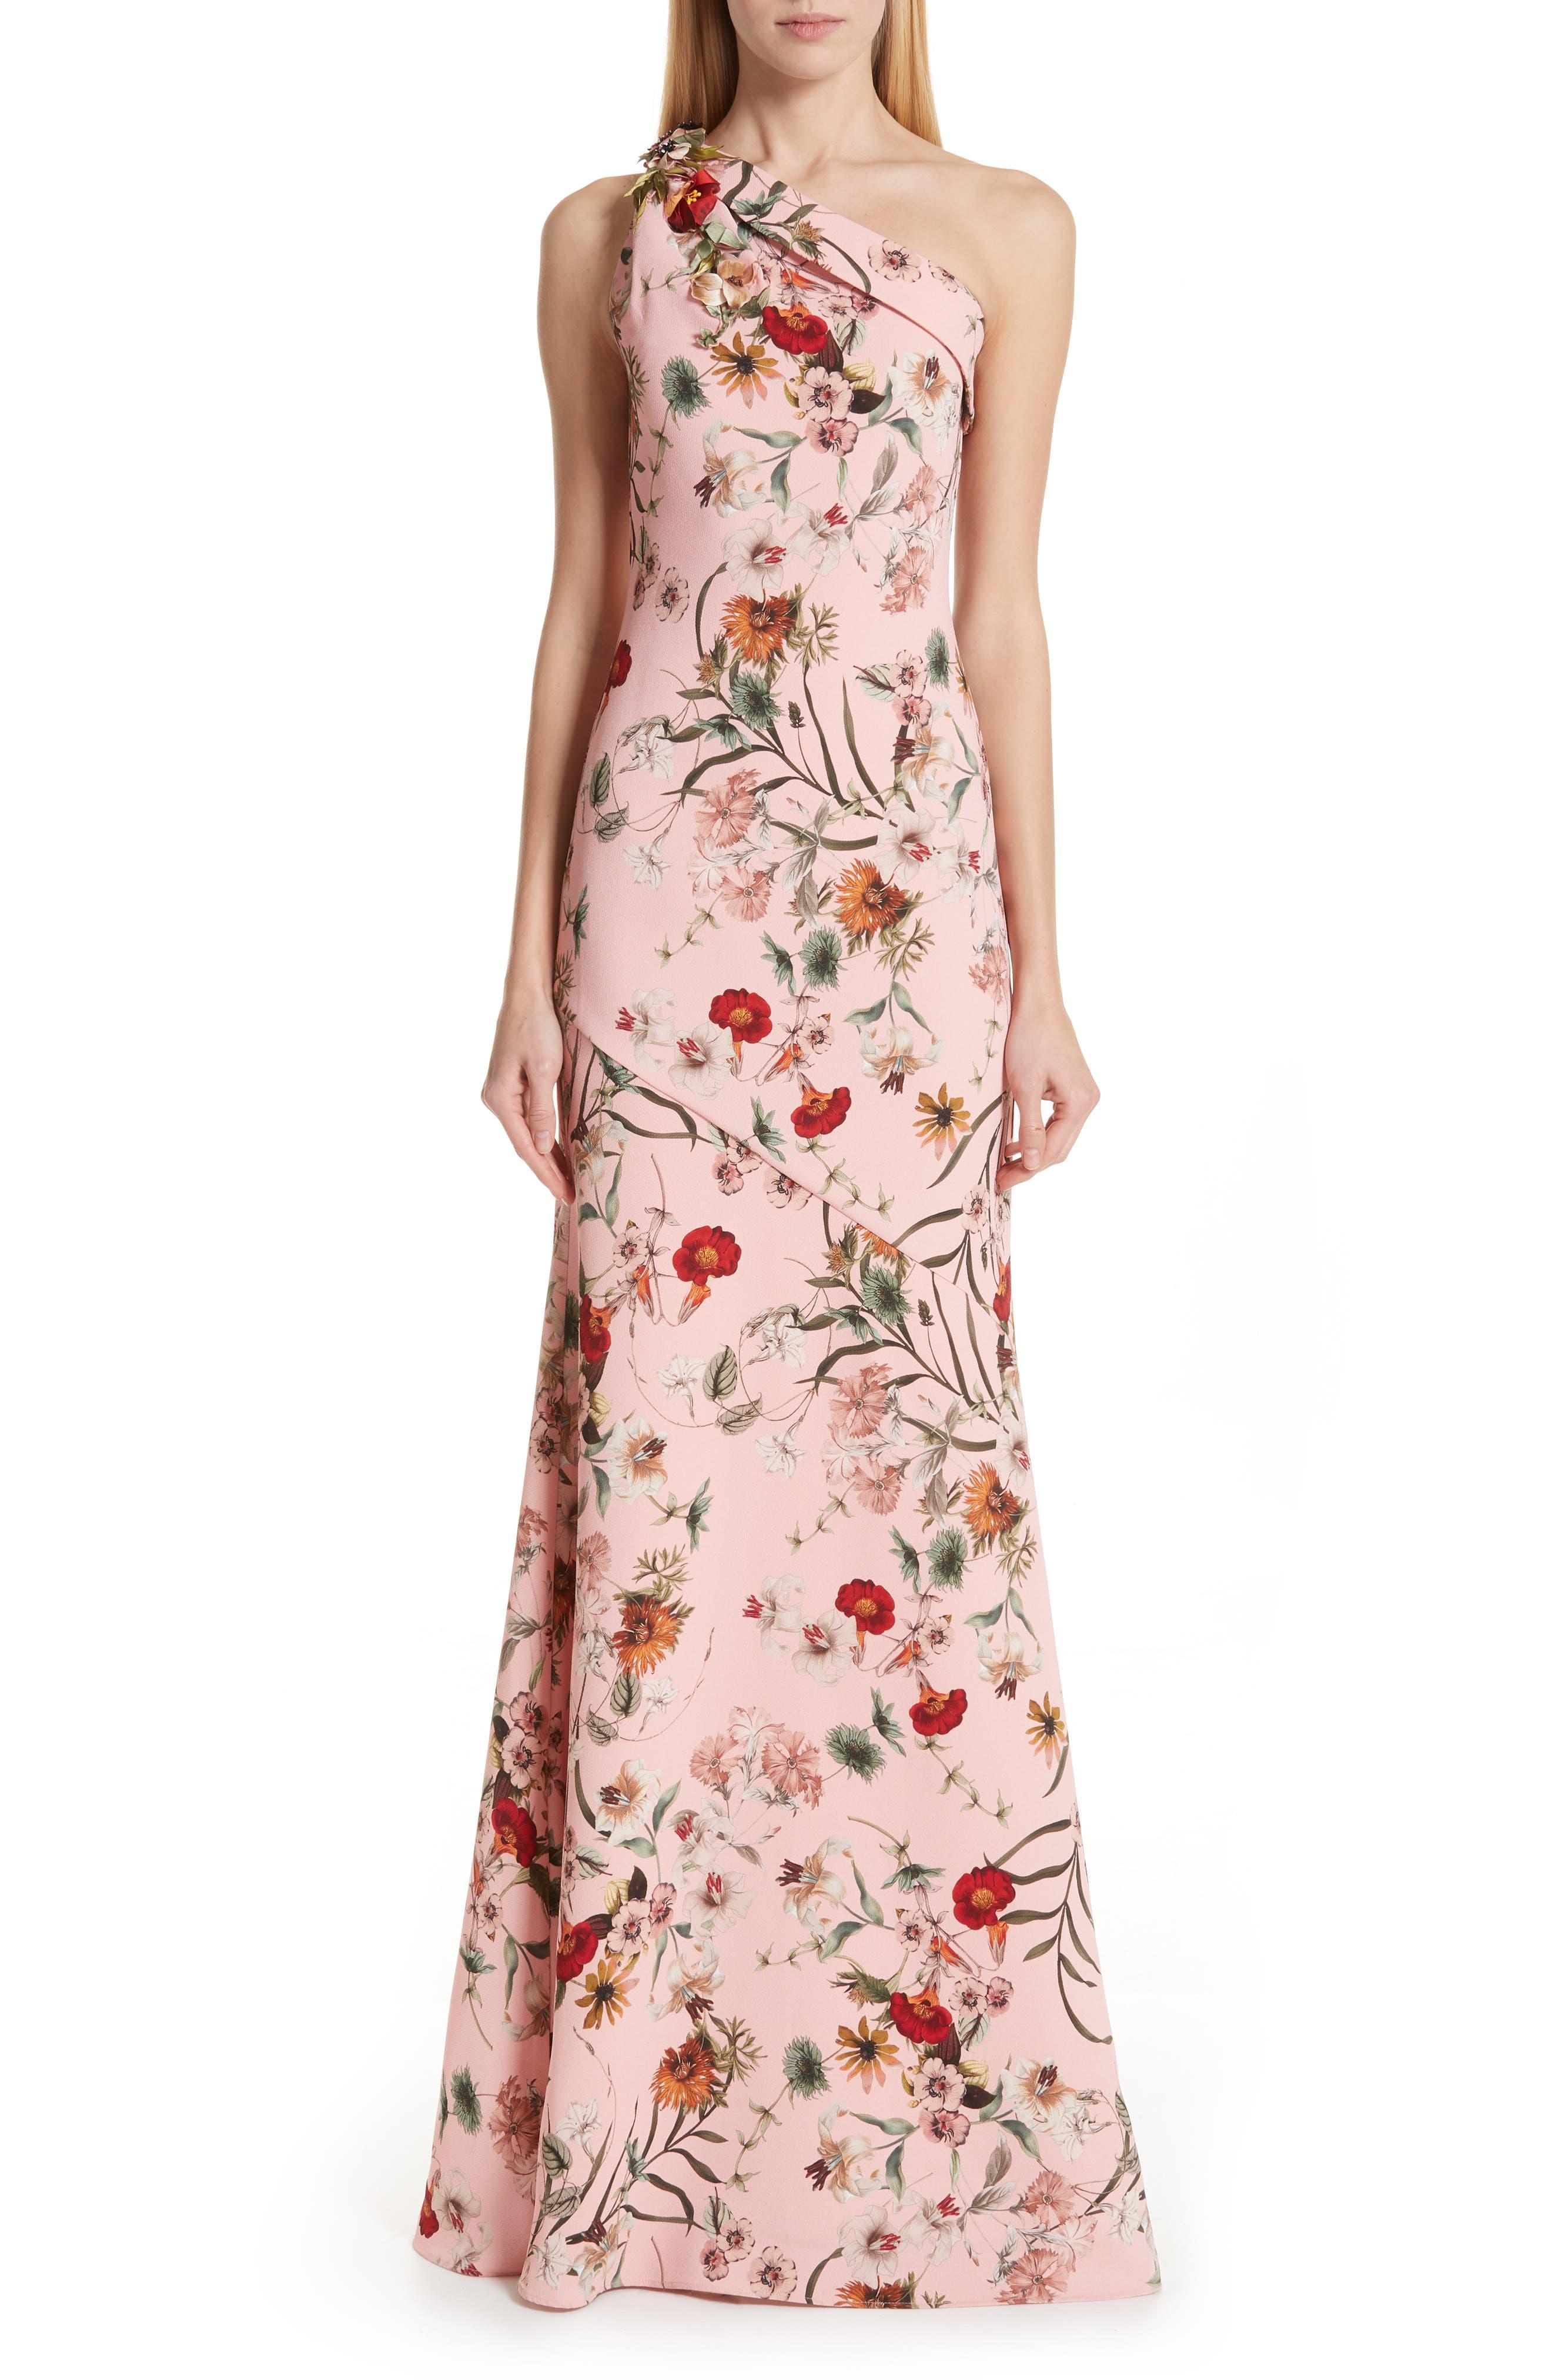 BADGLEY MISCHKA COLLECTION,                             Badgley Mischka One-Shoulder Floral Evening Dress,                             Main thumbnail 1, color,                             650